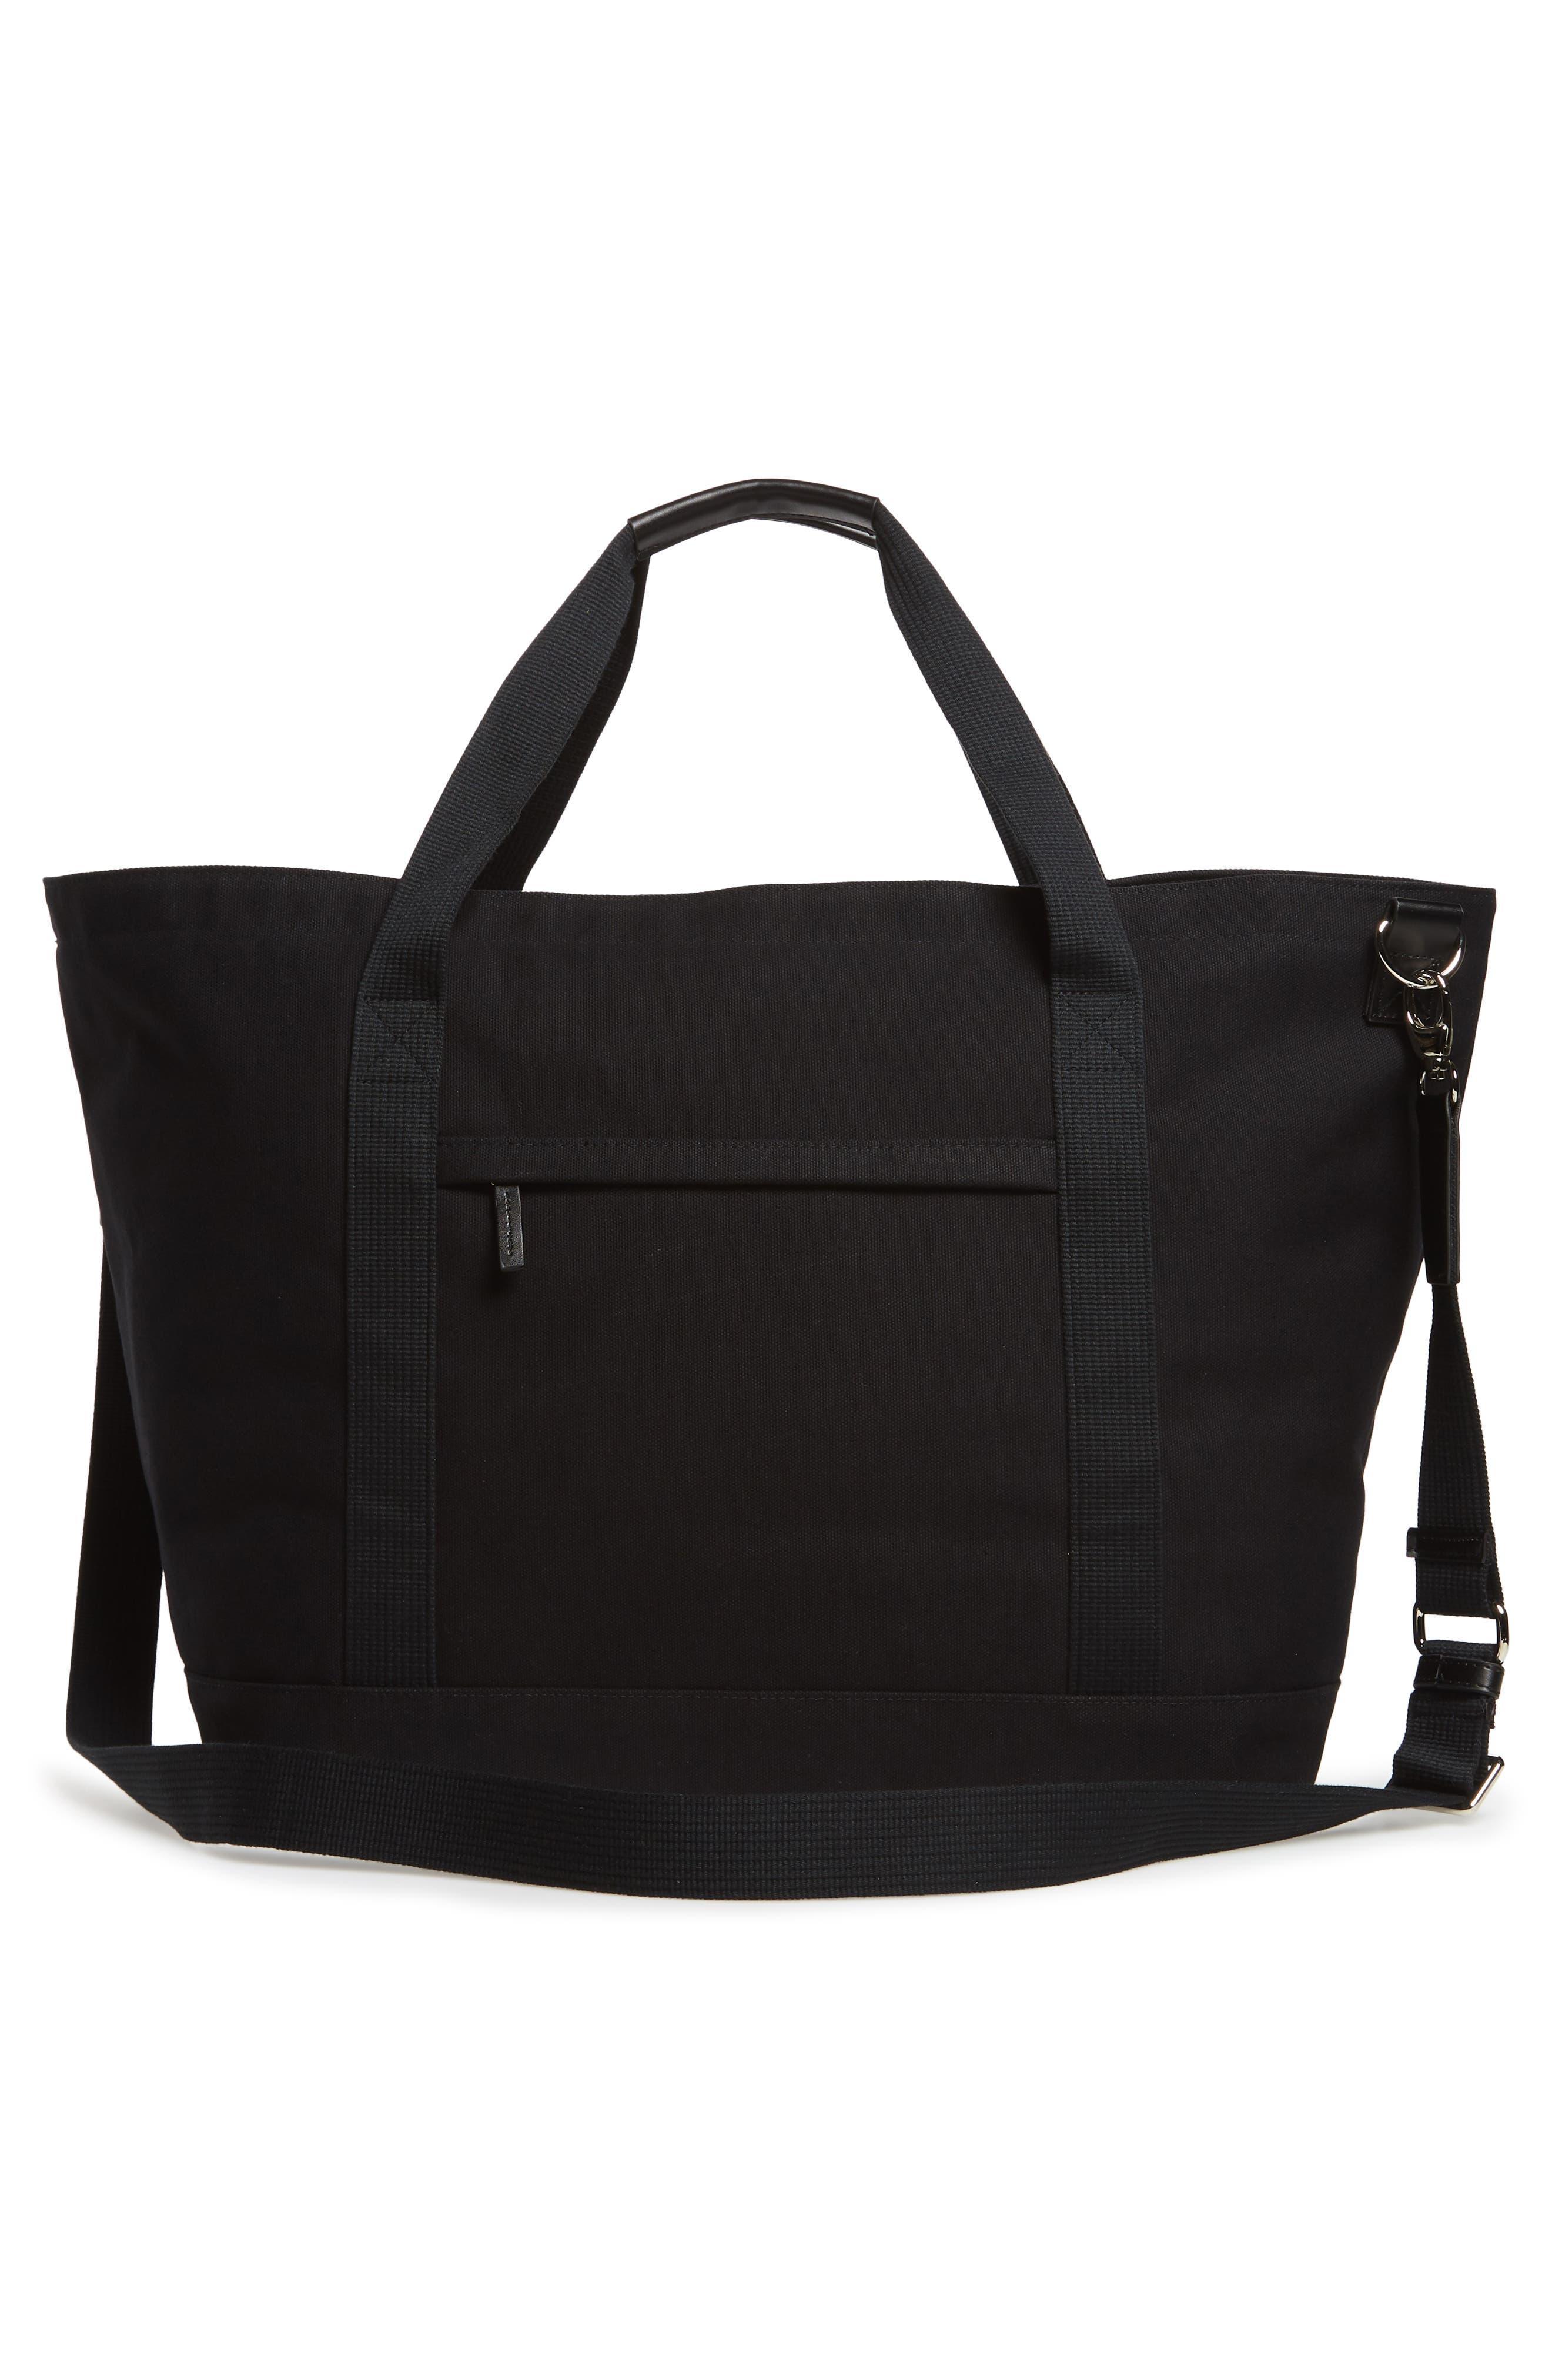 Weekend Water Repellent Tote Bag,                             Alternate thumbnail 3, color,                             Black